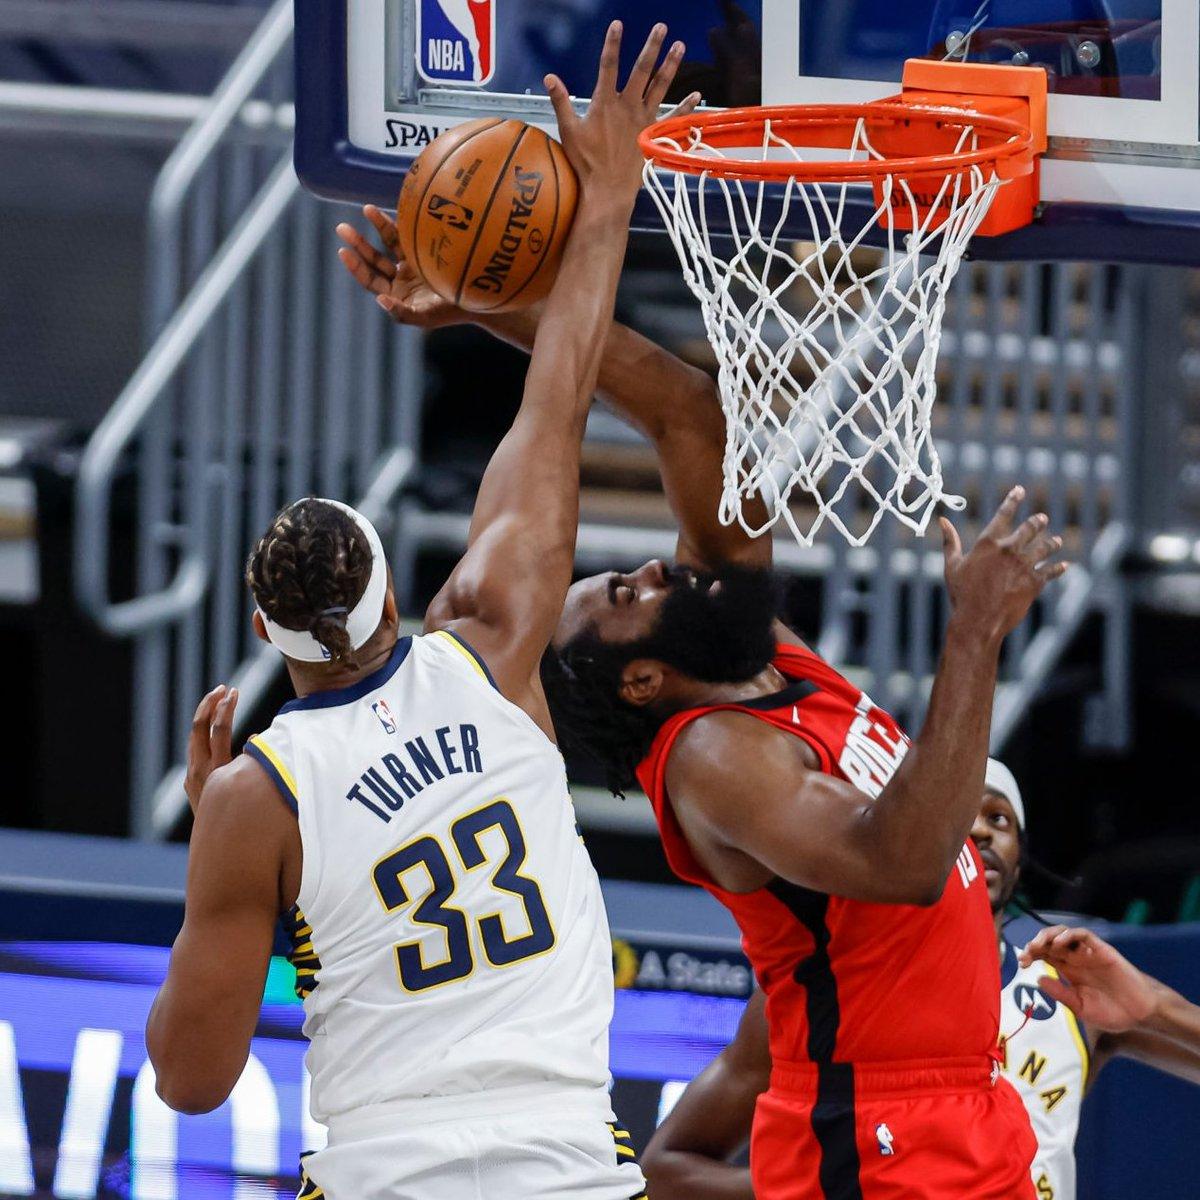 RT @AKRileyy5: NBA Block Leaders:  1. Myles Turner - 50  Lol.   2. Rudy Gobert - 29 https://t.co/35ARXKKyd1